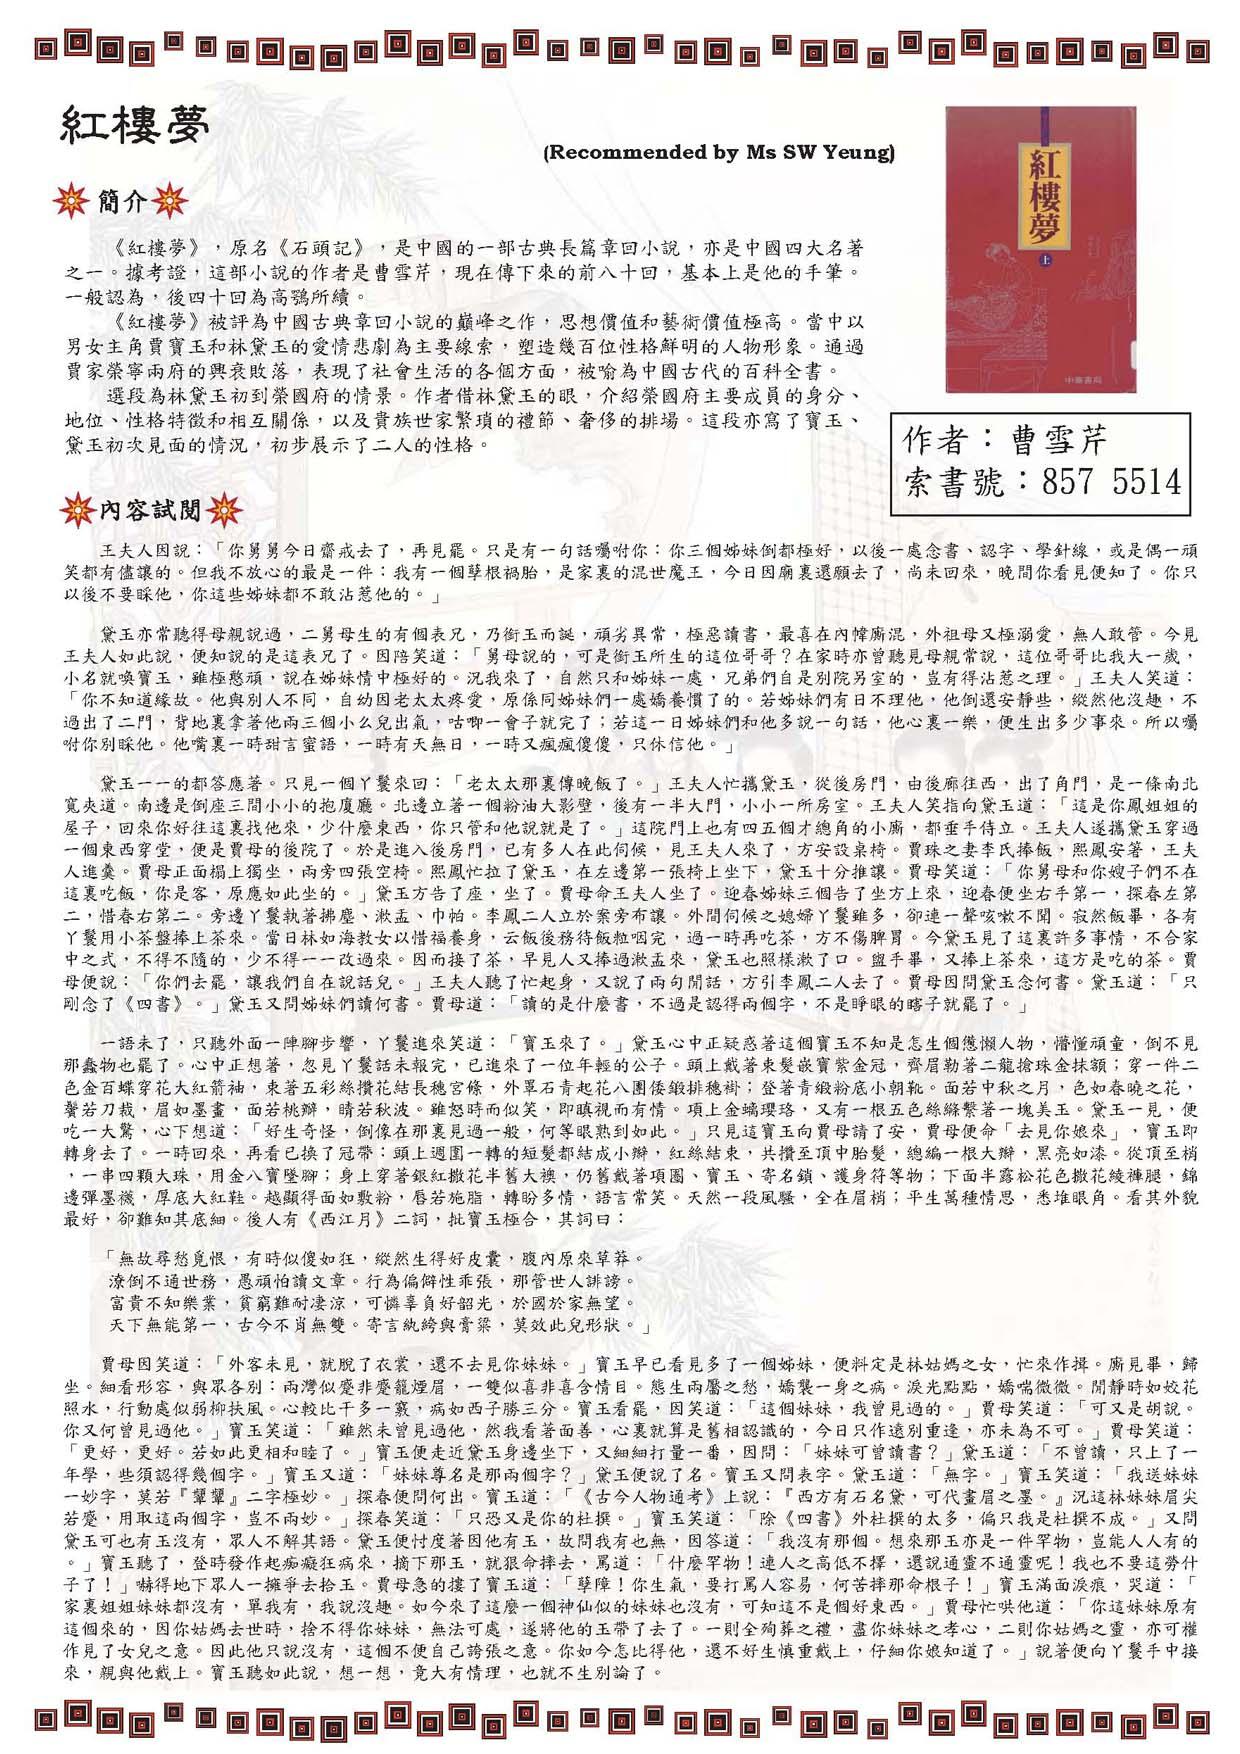 Uncategorized – Page 7 – Stewards Pooi Kei College Library —– 香港神託會培基書院圖書館